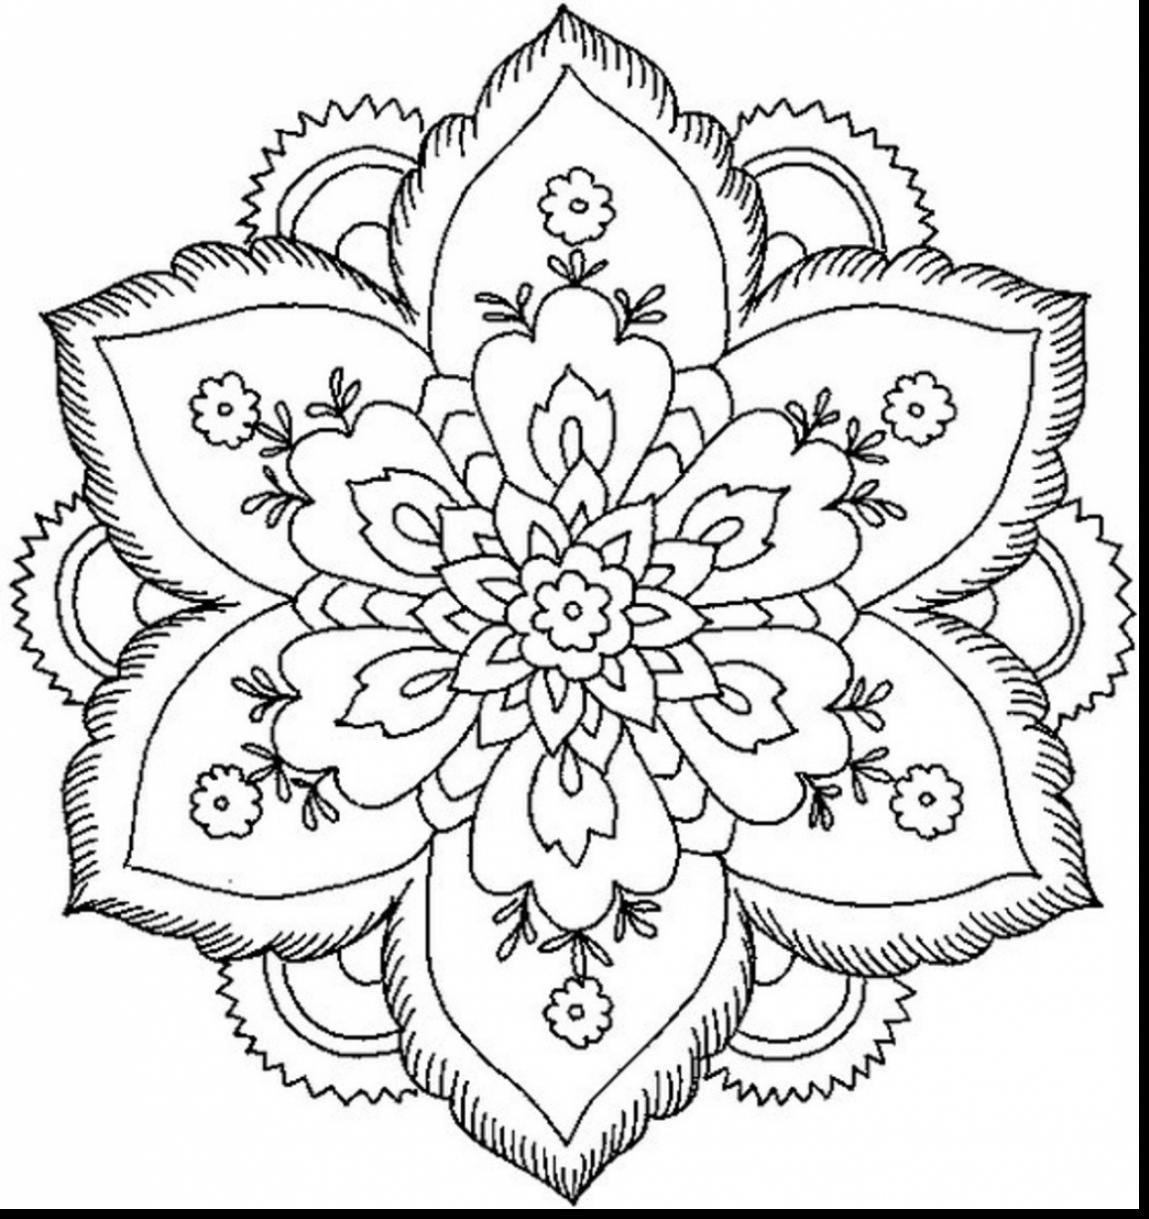 1149x1219 Inspiring Design Coloring Pages For Older Kids Terrific Flower